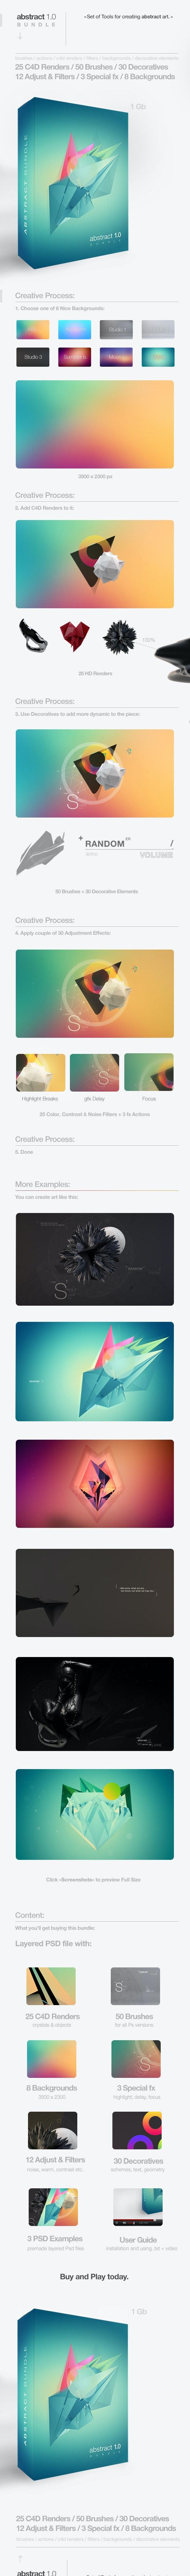 Abstract 1.0 Bundle - Brushes Photoshop